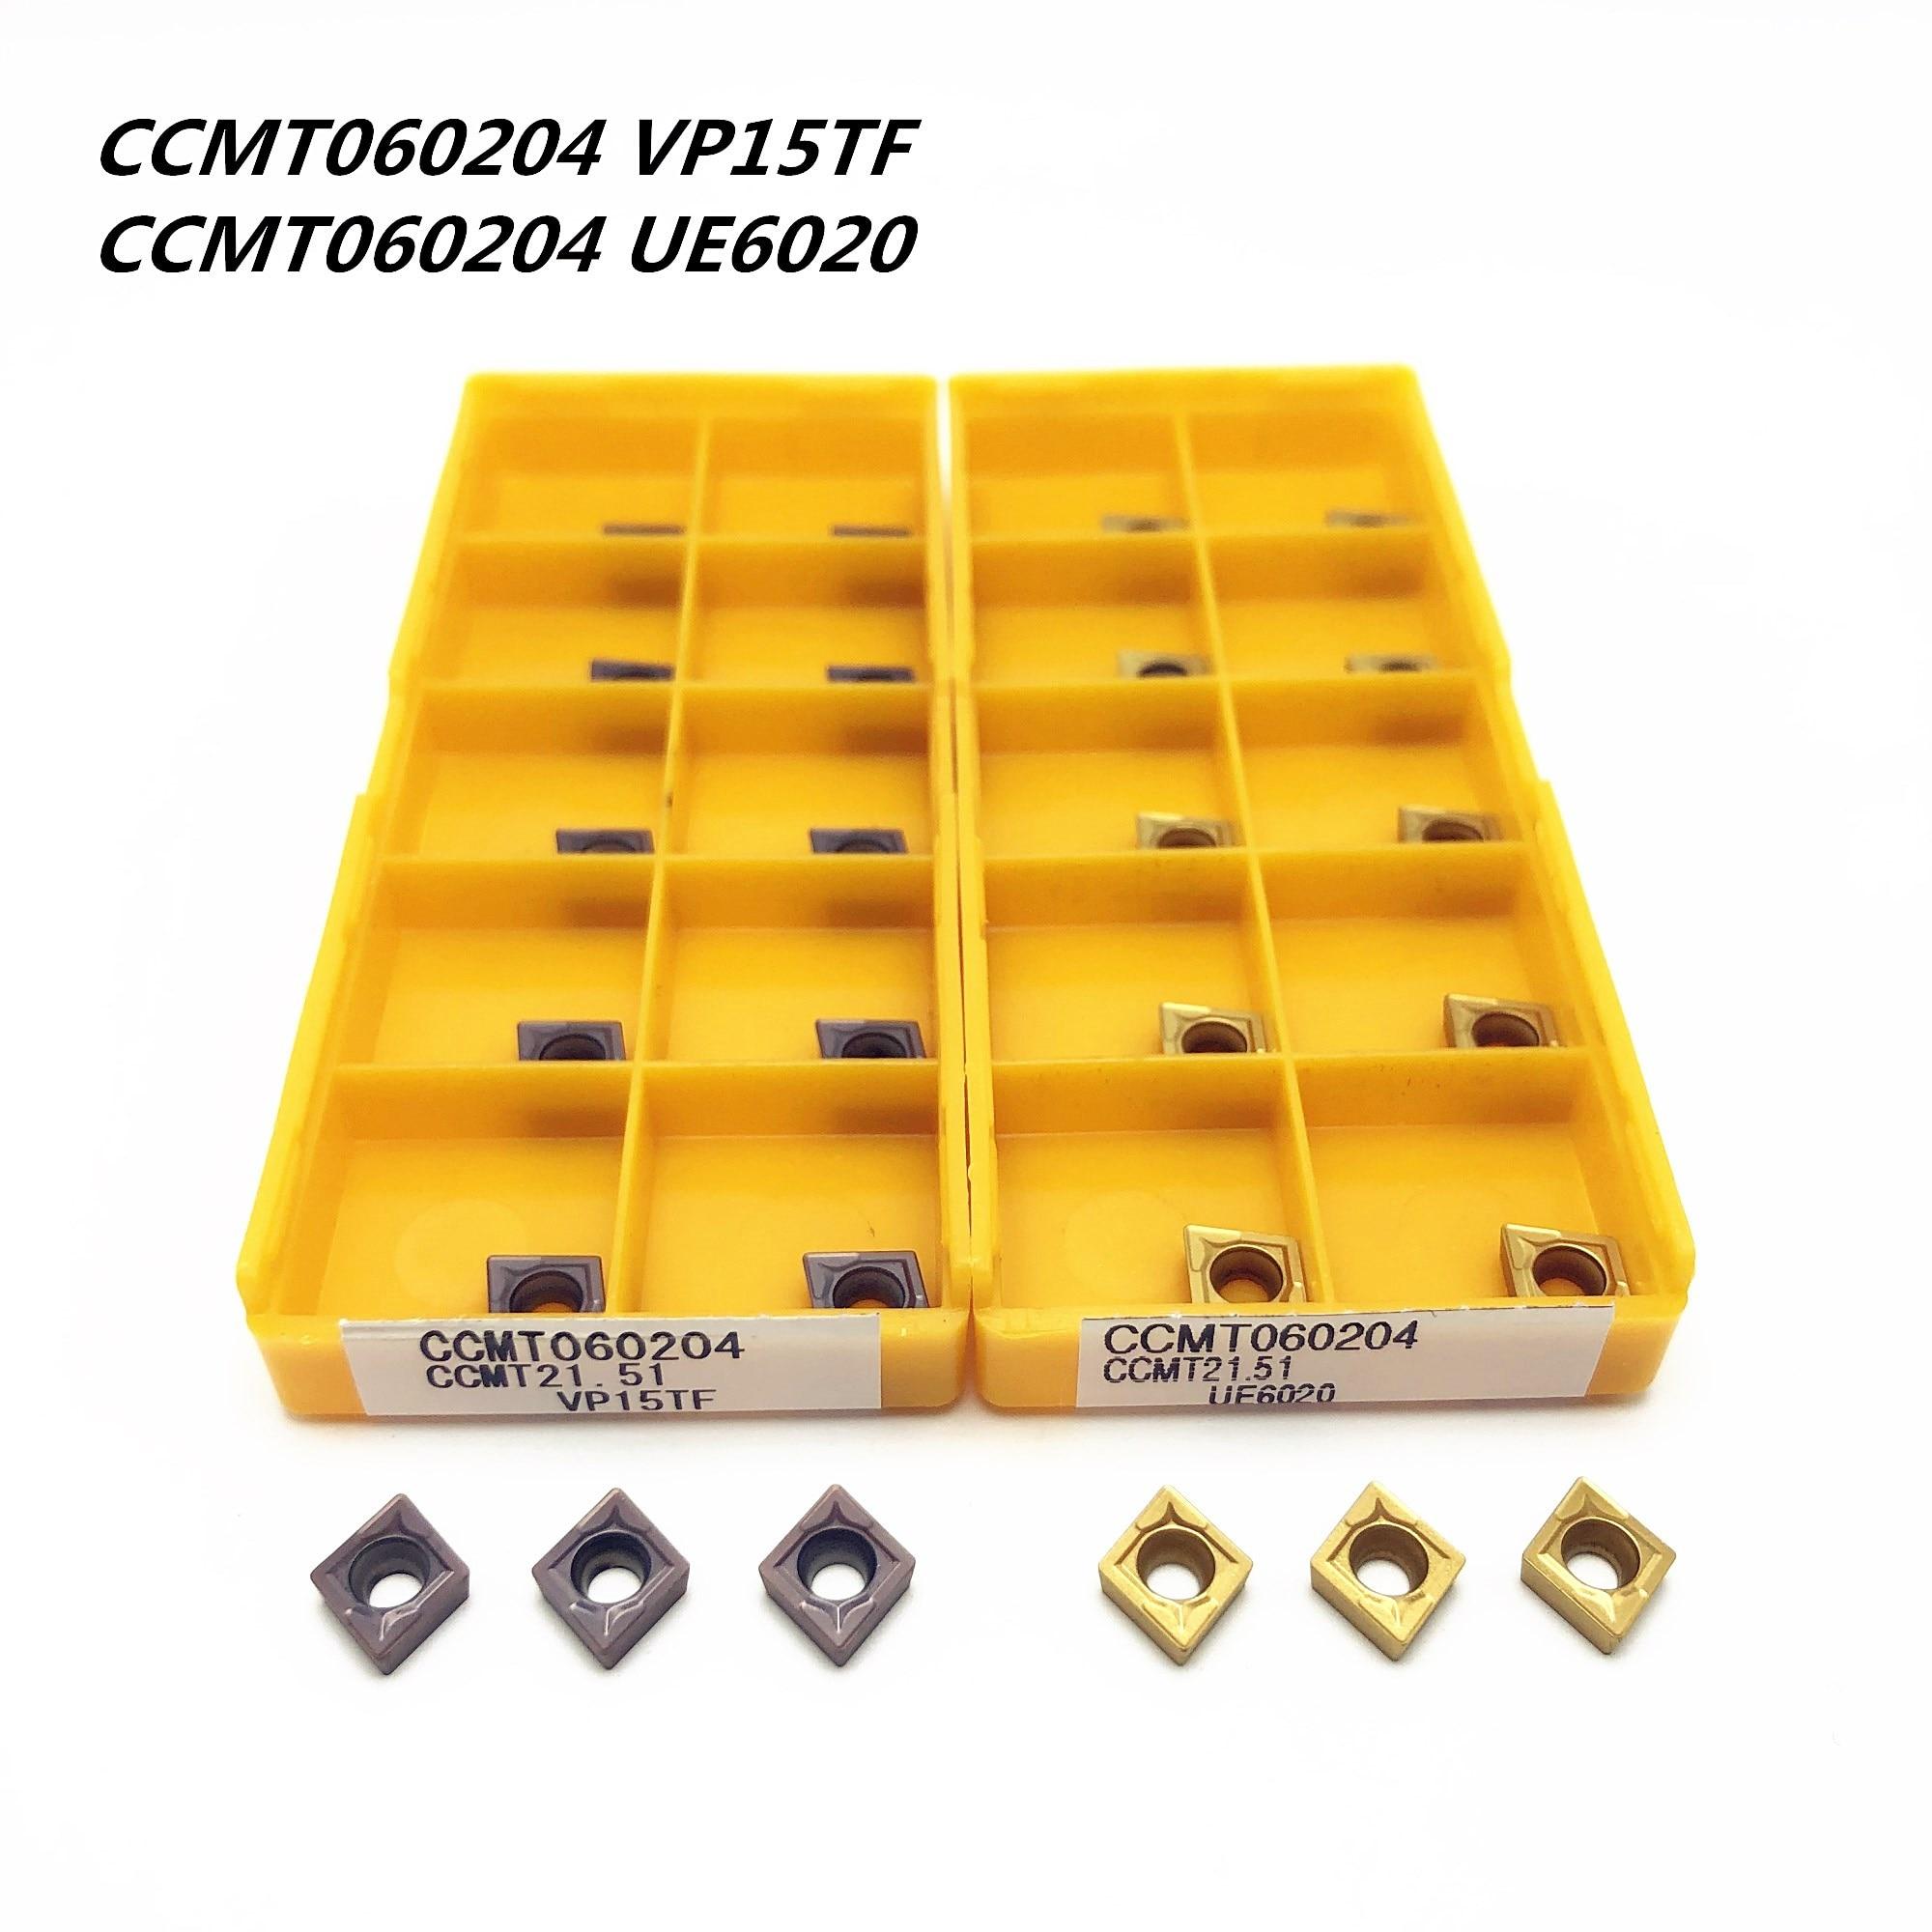 Tungsten Carbide CCMT060204 UE6020 VP15TF US735 Internal Turning Tool Metal Turning Tool Carbide Insert CCMT 060204 Cutting Tool